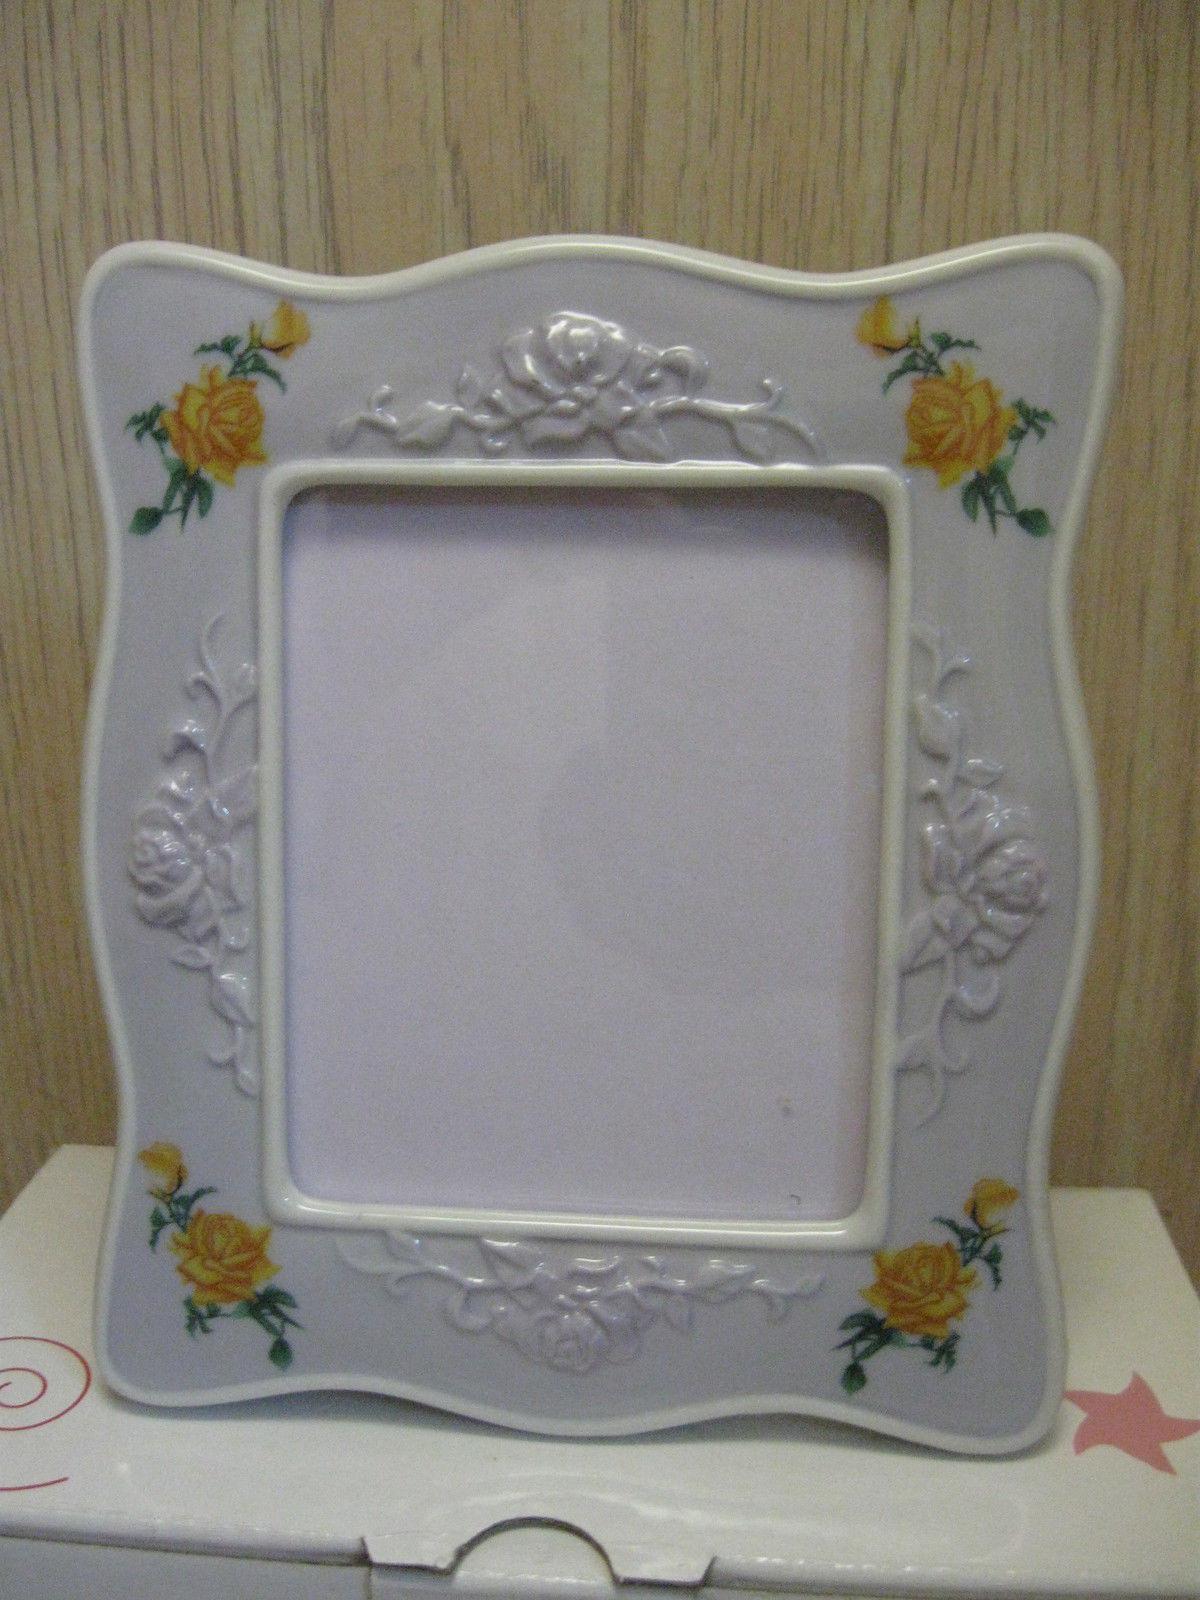 Birthday Gift 2007 President's Club Porcelain Frame Set Qty 3 Avon